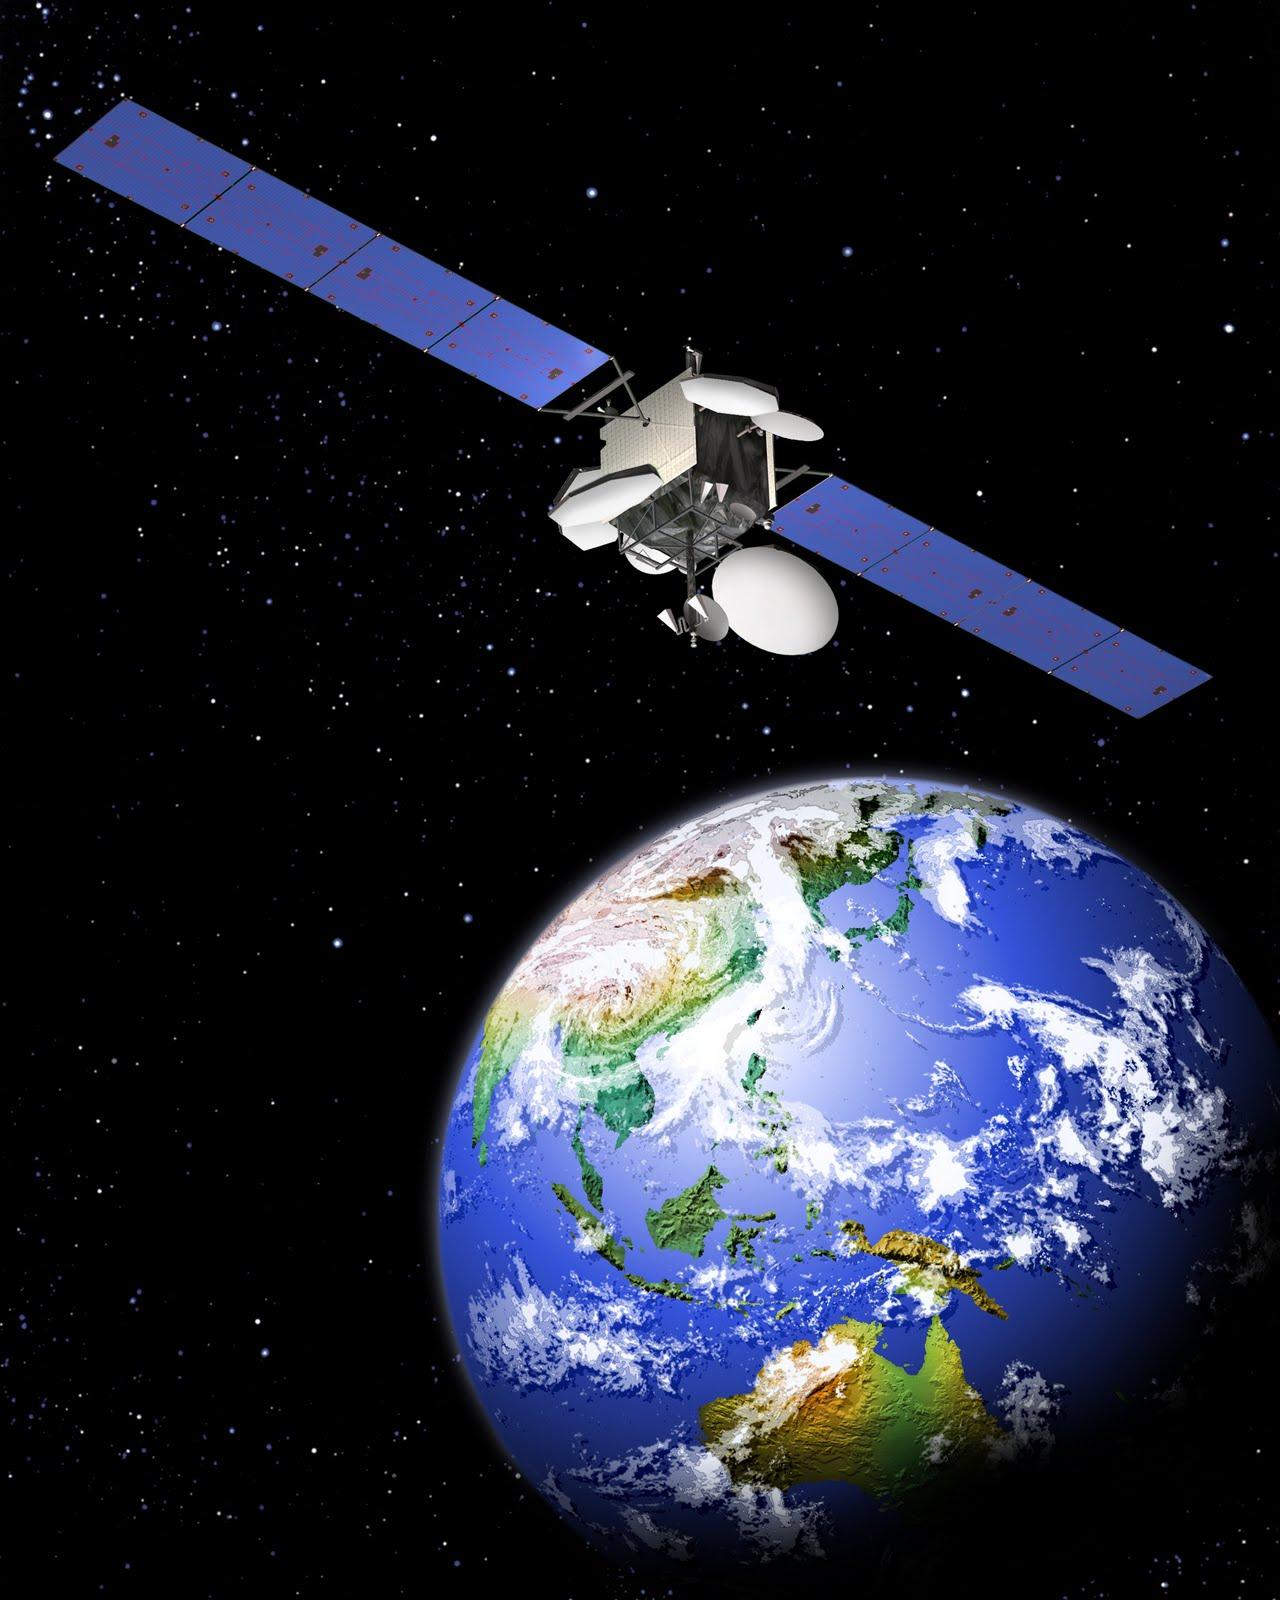 Olivia carroll satellite wallpaper hd - Satellite wallpaper hd ...